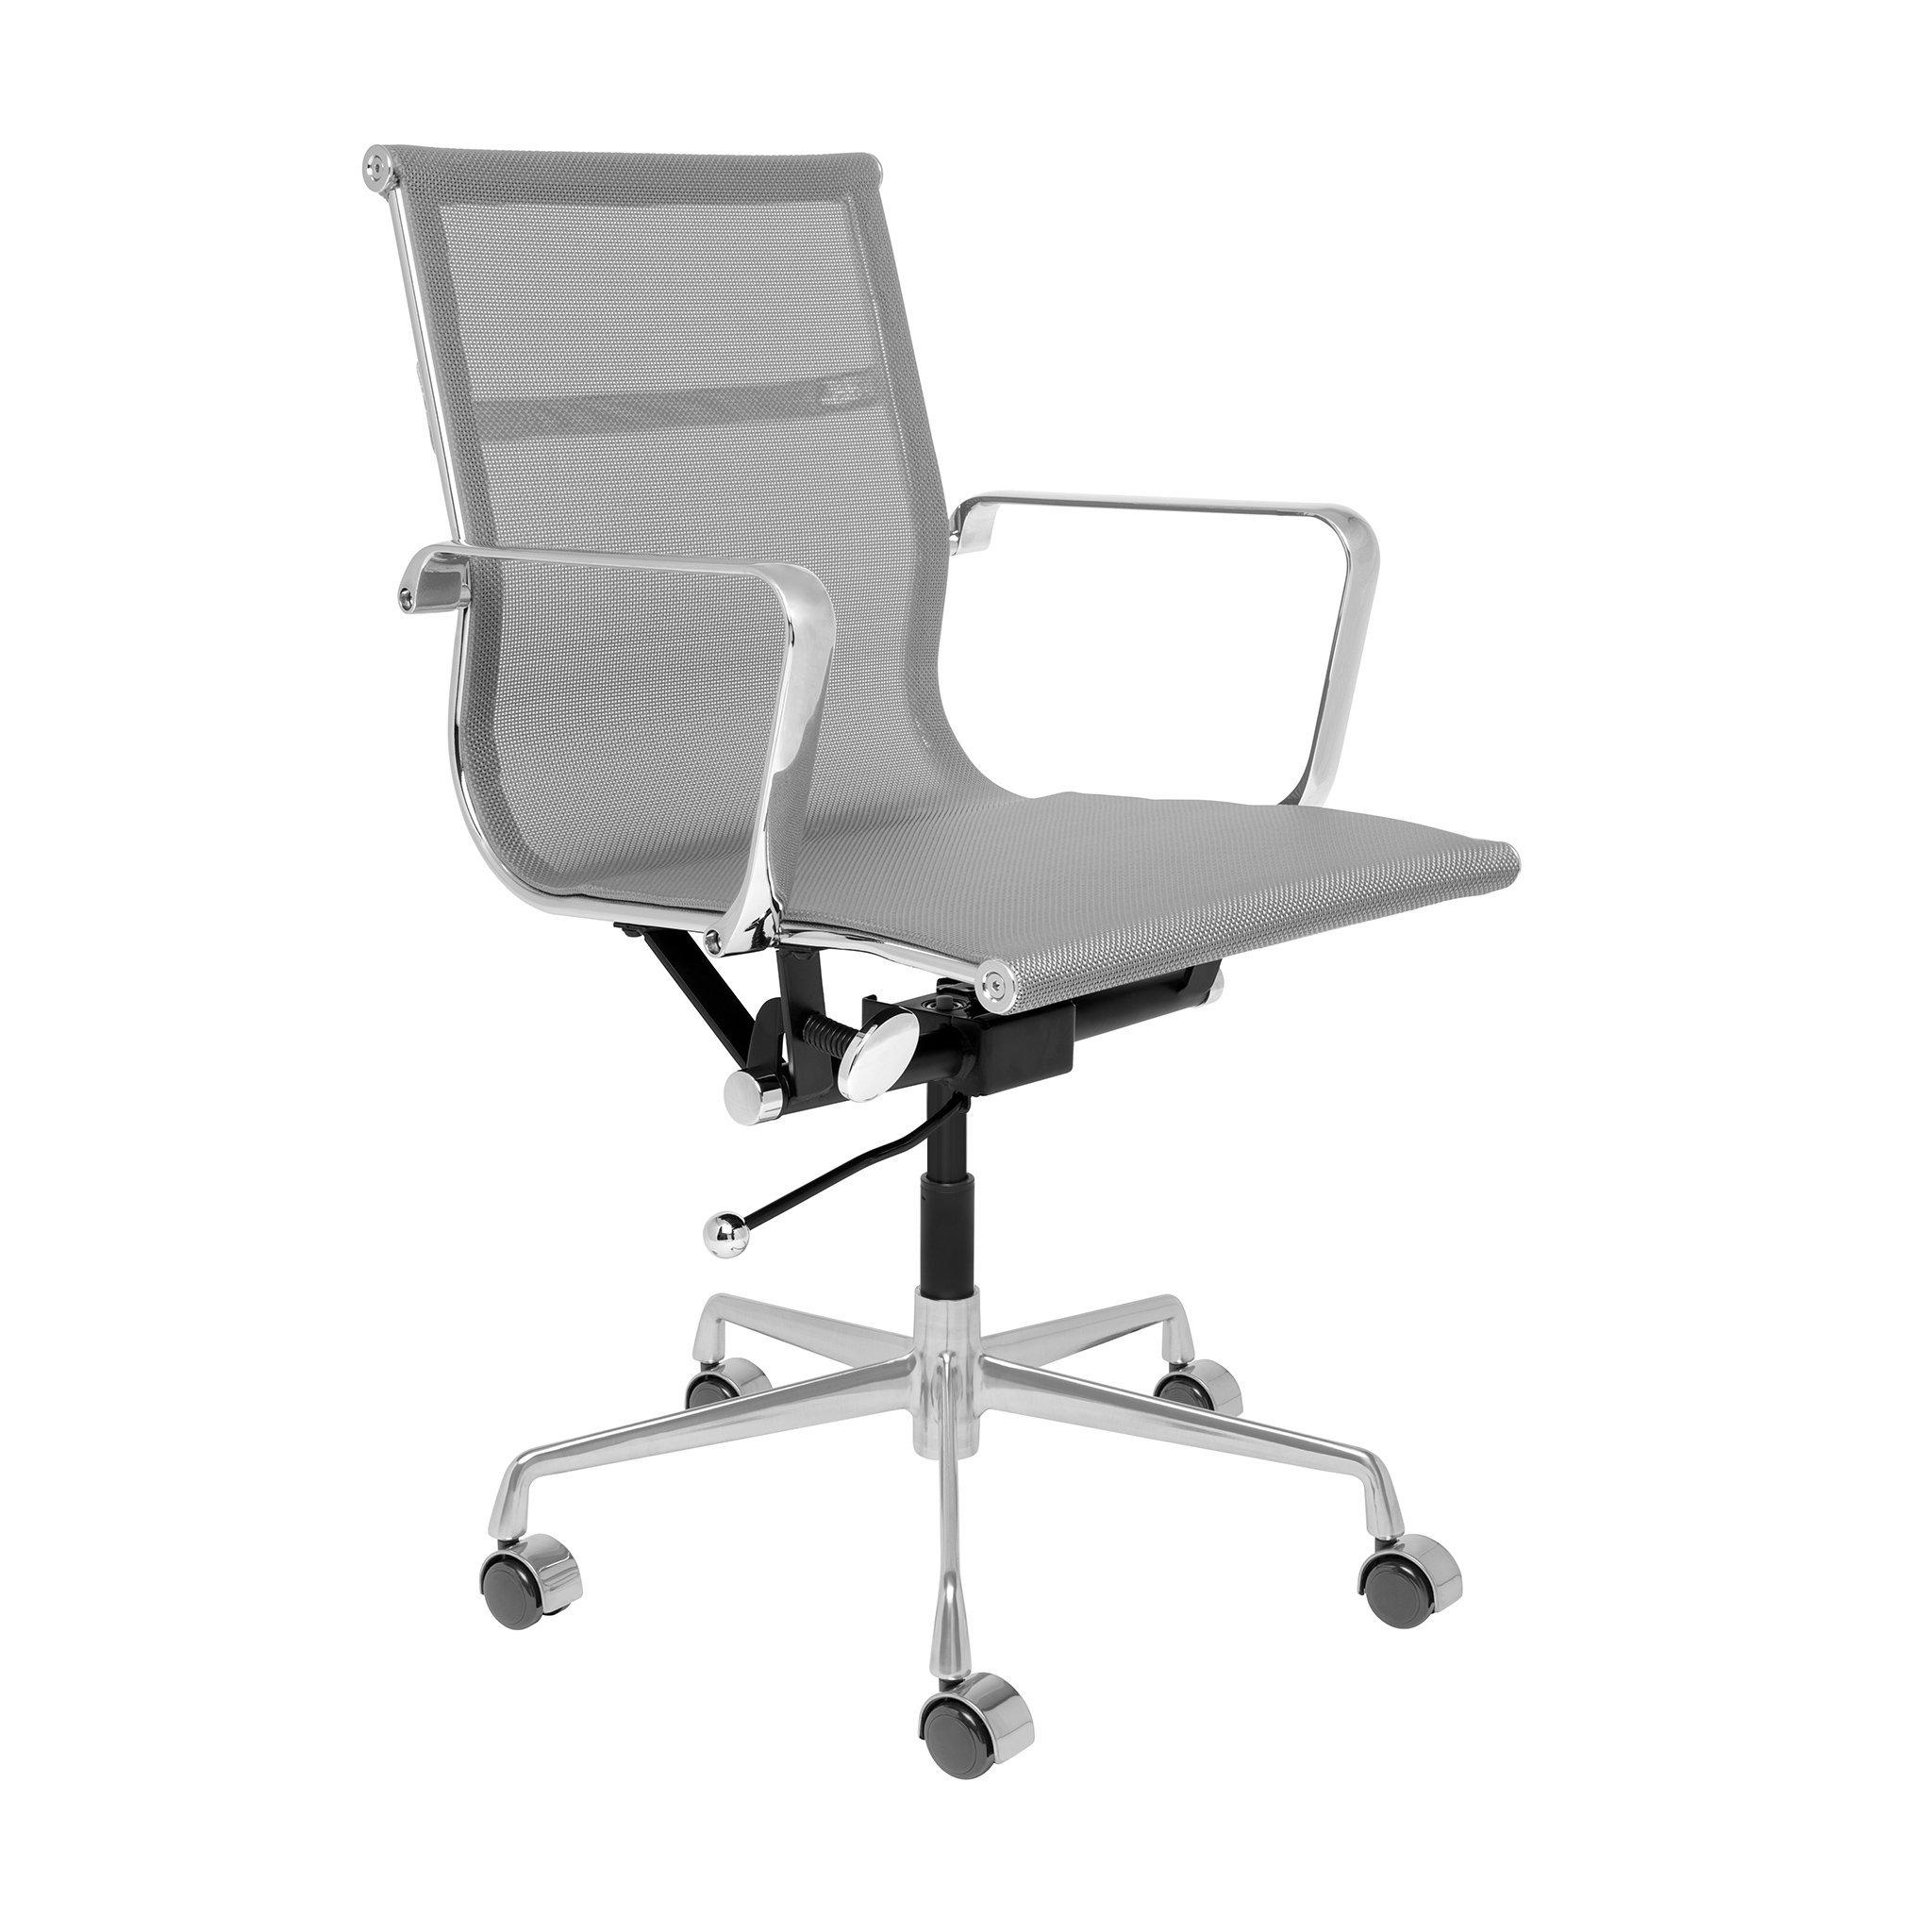 Anneville Ergonomic Mesh Office Chair